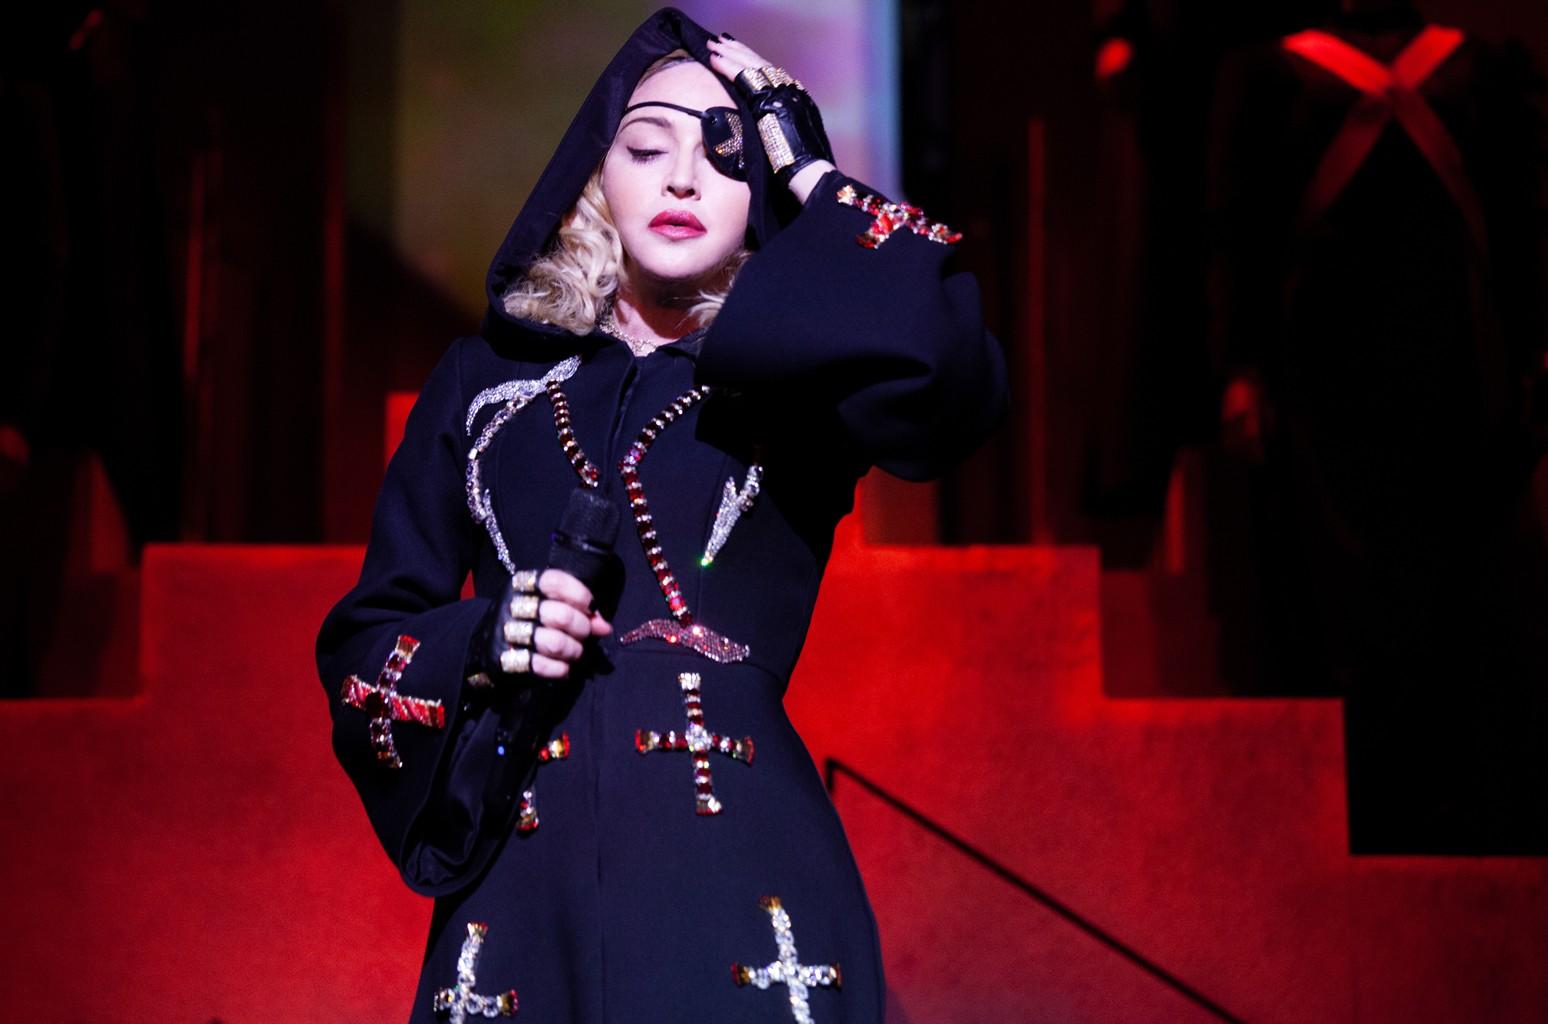 Credit: Billboard Magazine